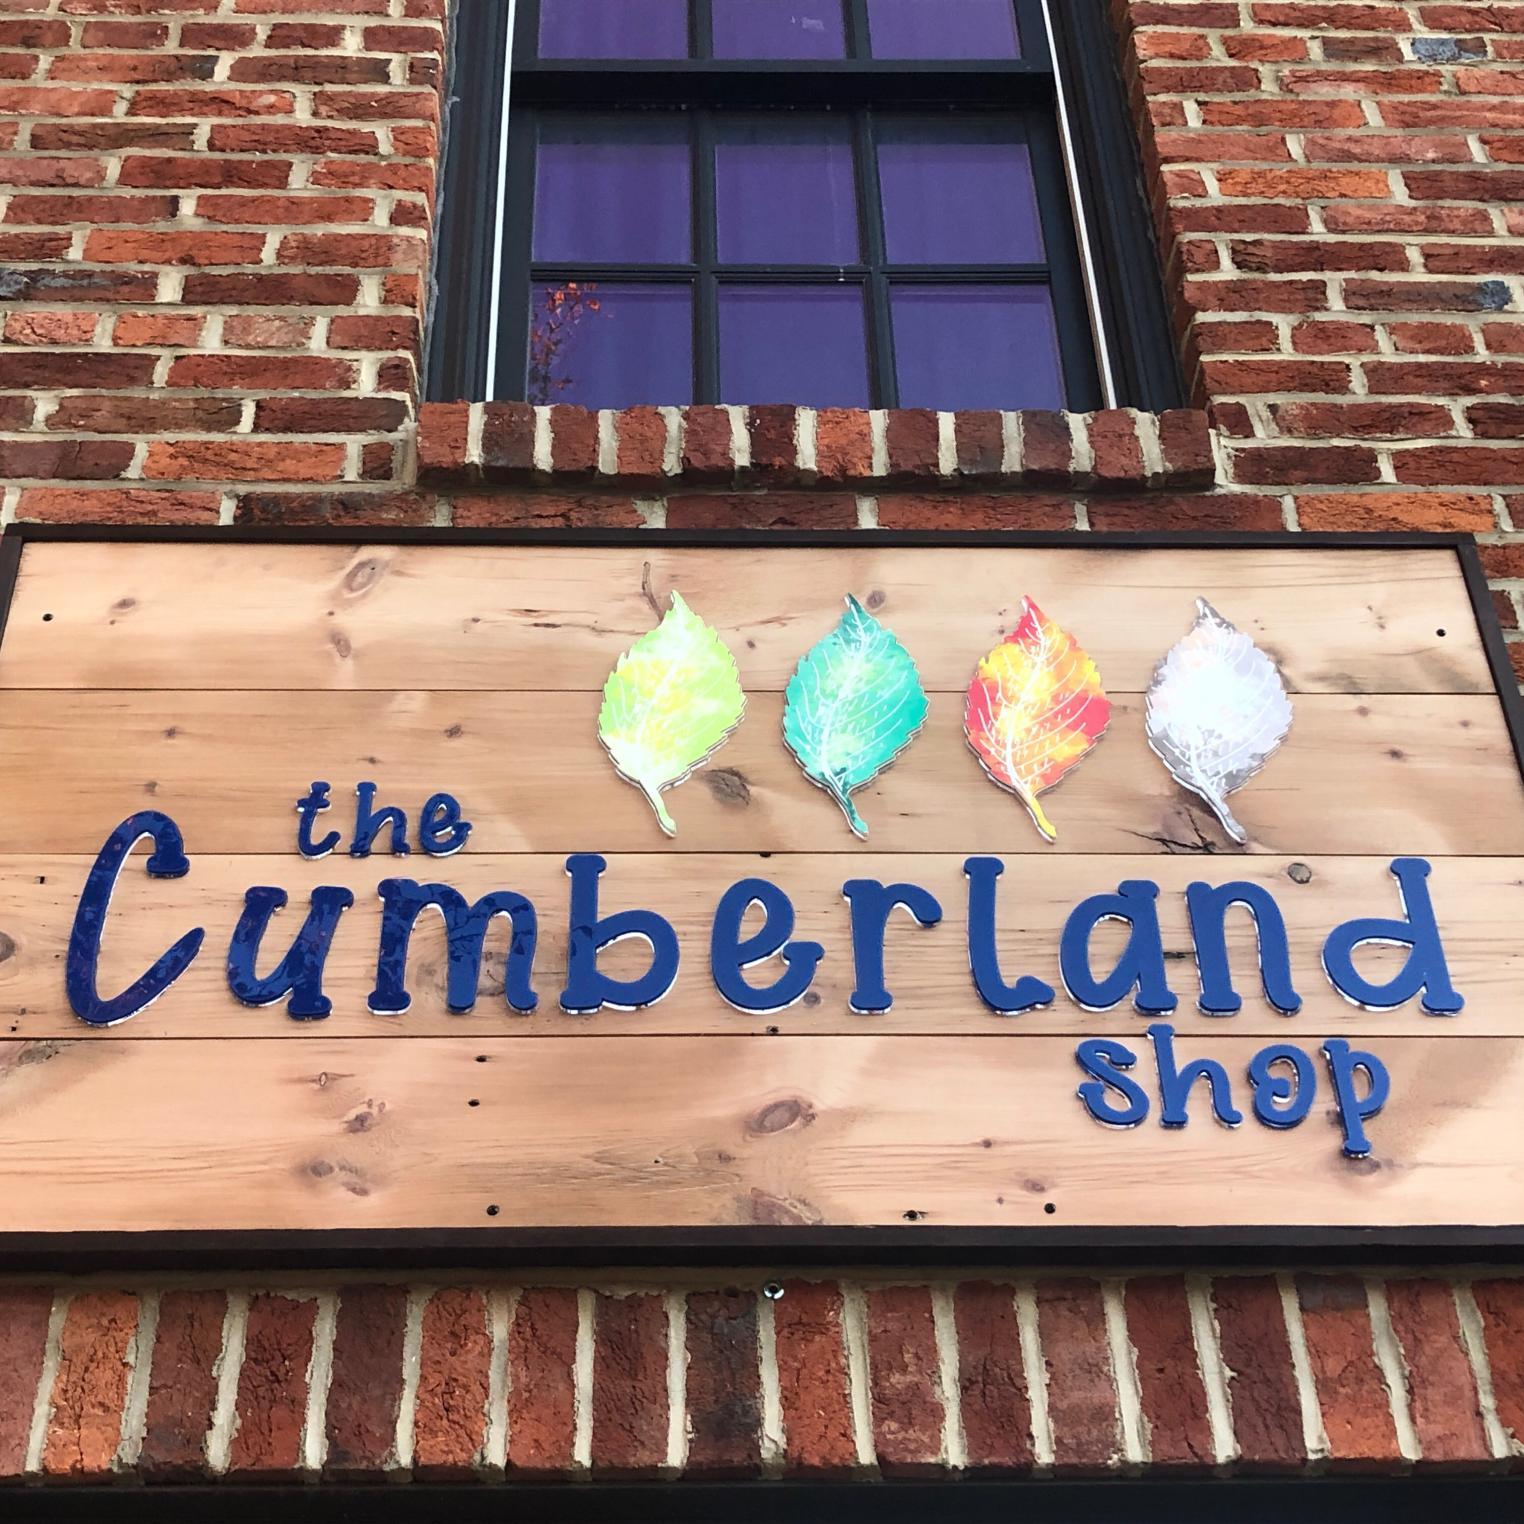 The Cumberland Shop